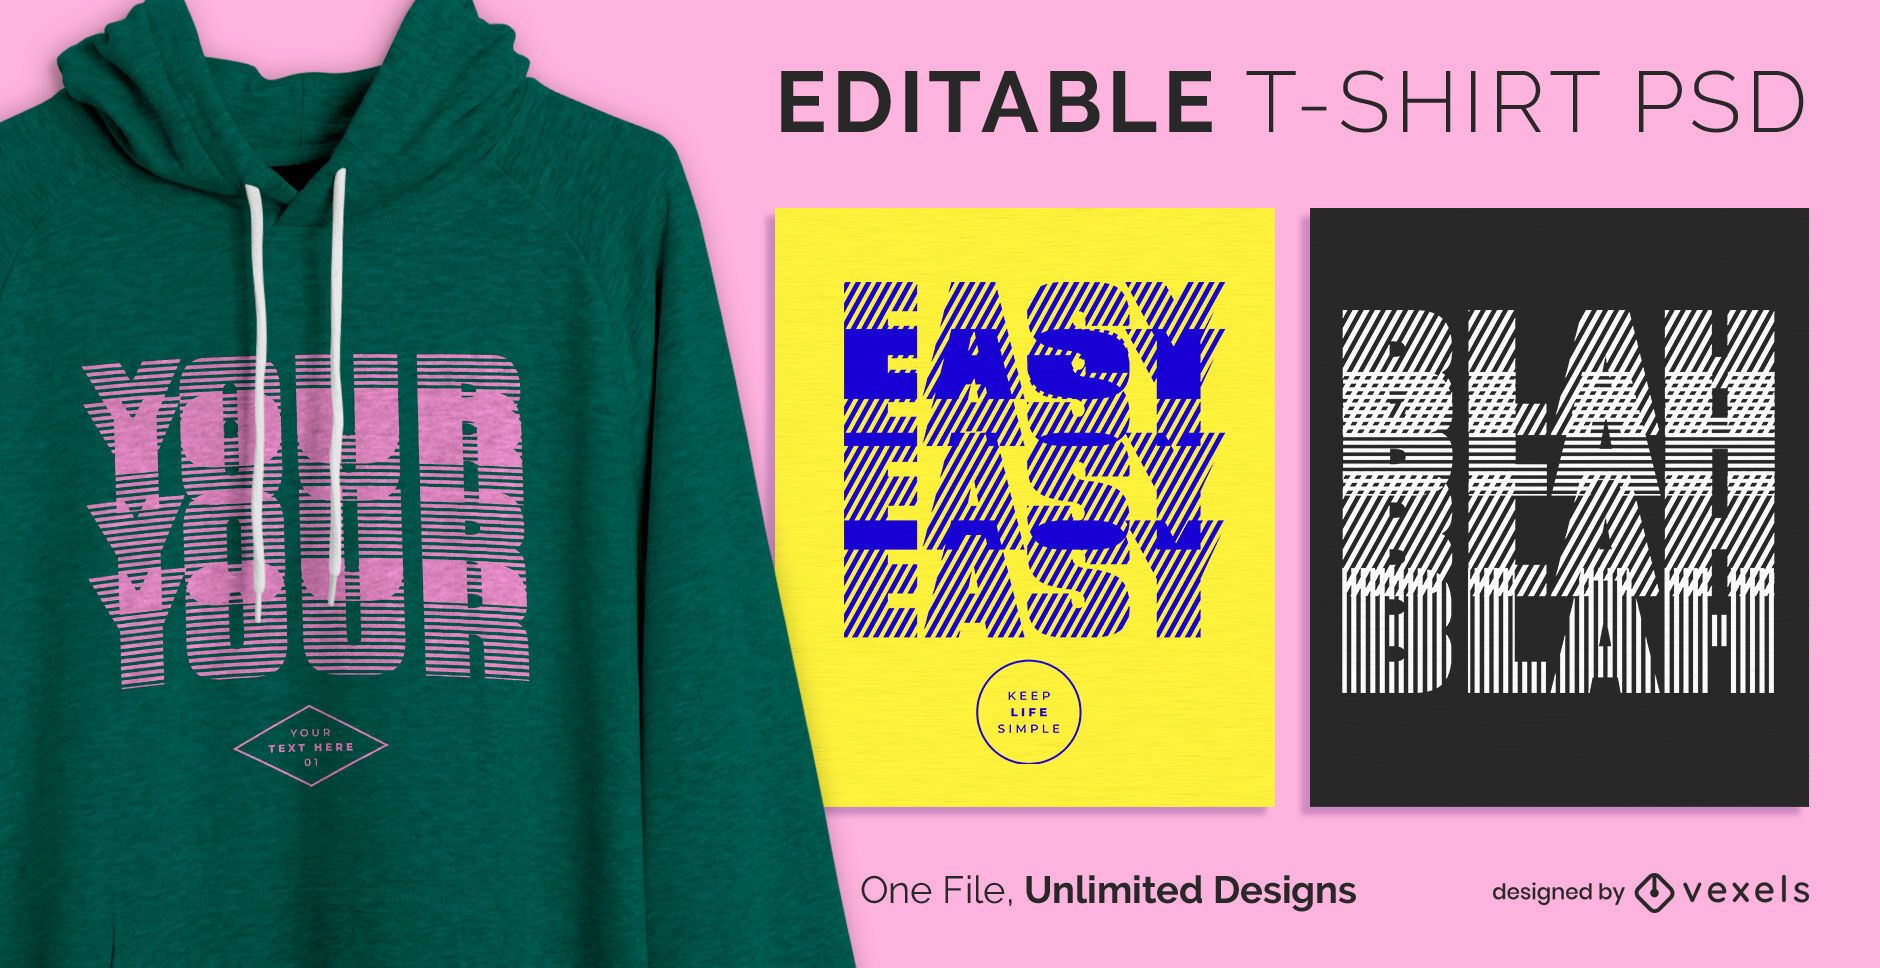 Blurry text scalable t-shirt psd